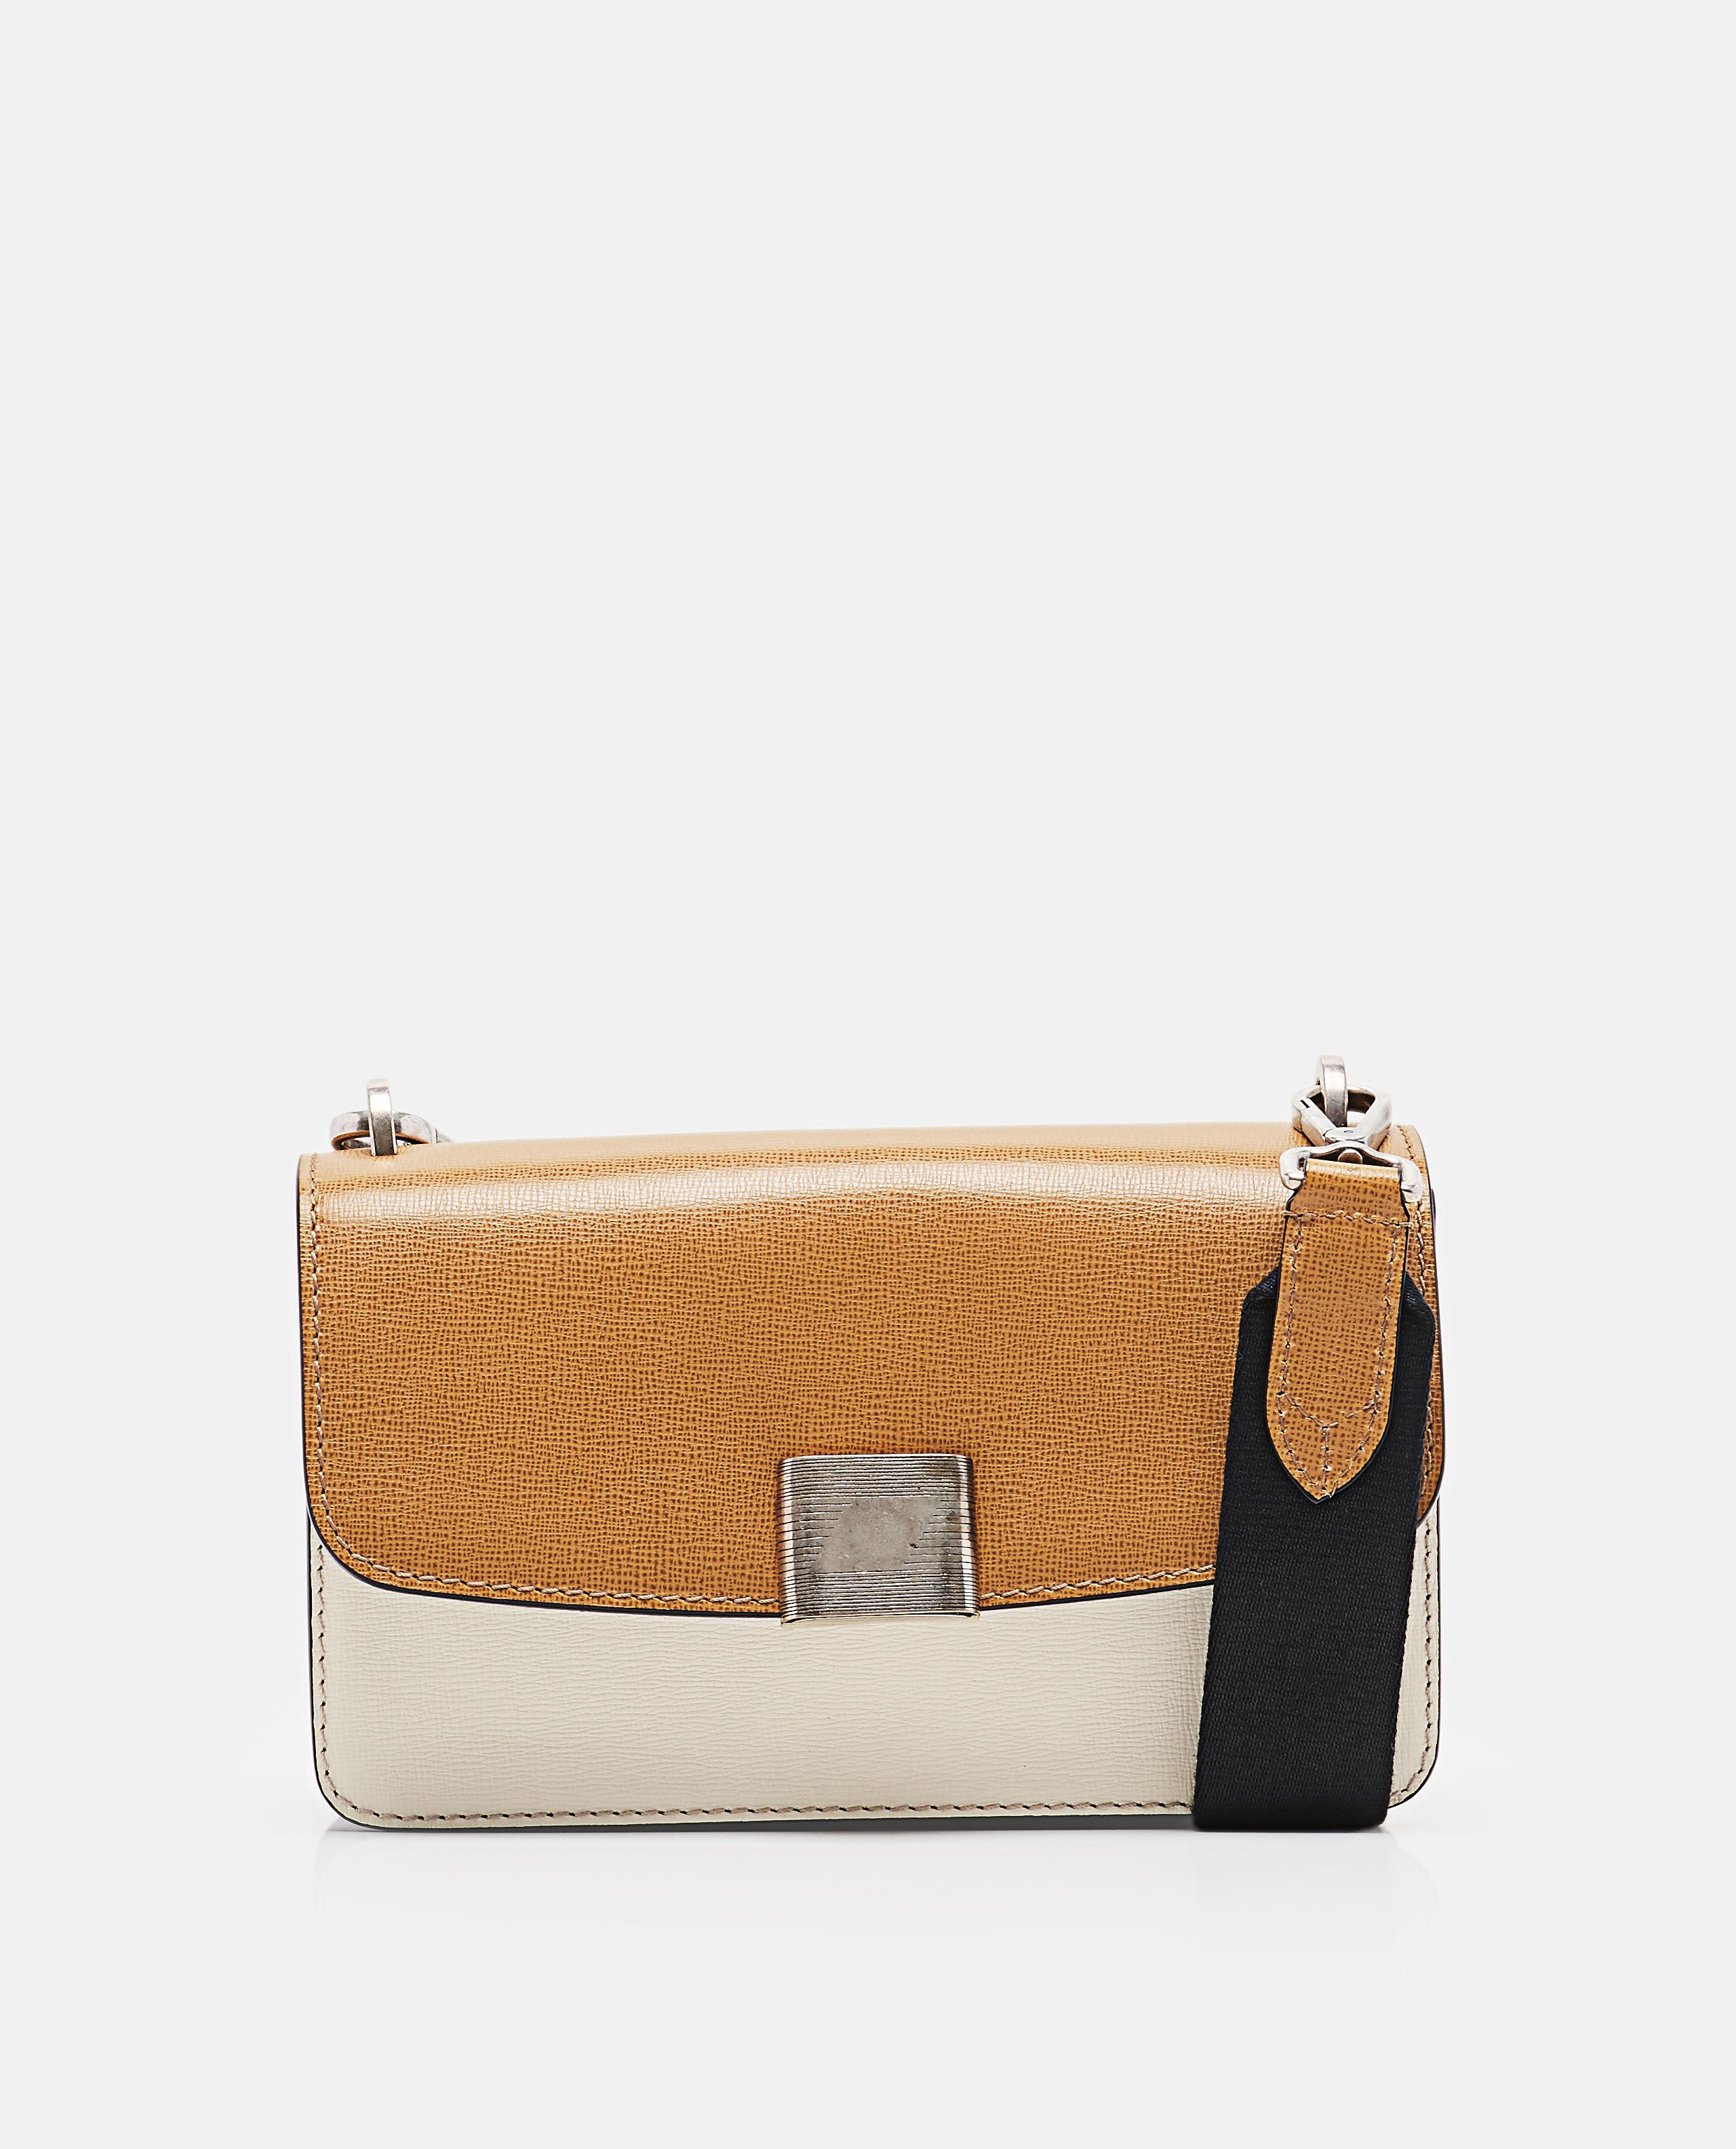 72ad69bf9c Lyst - Golden Goose Deluxe Brand Valentina Mini Handbags in Brown